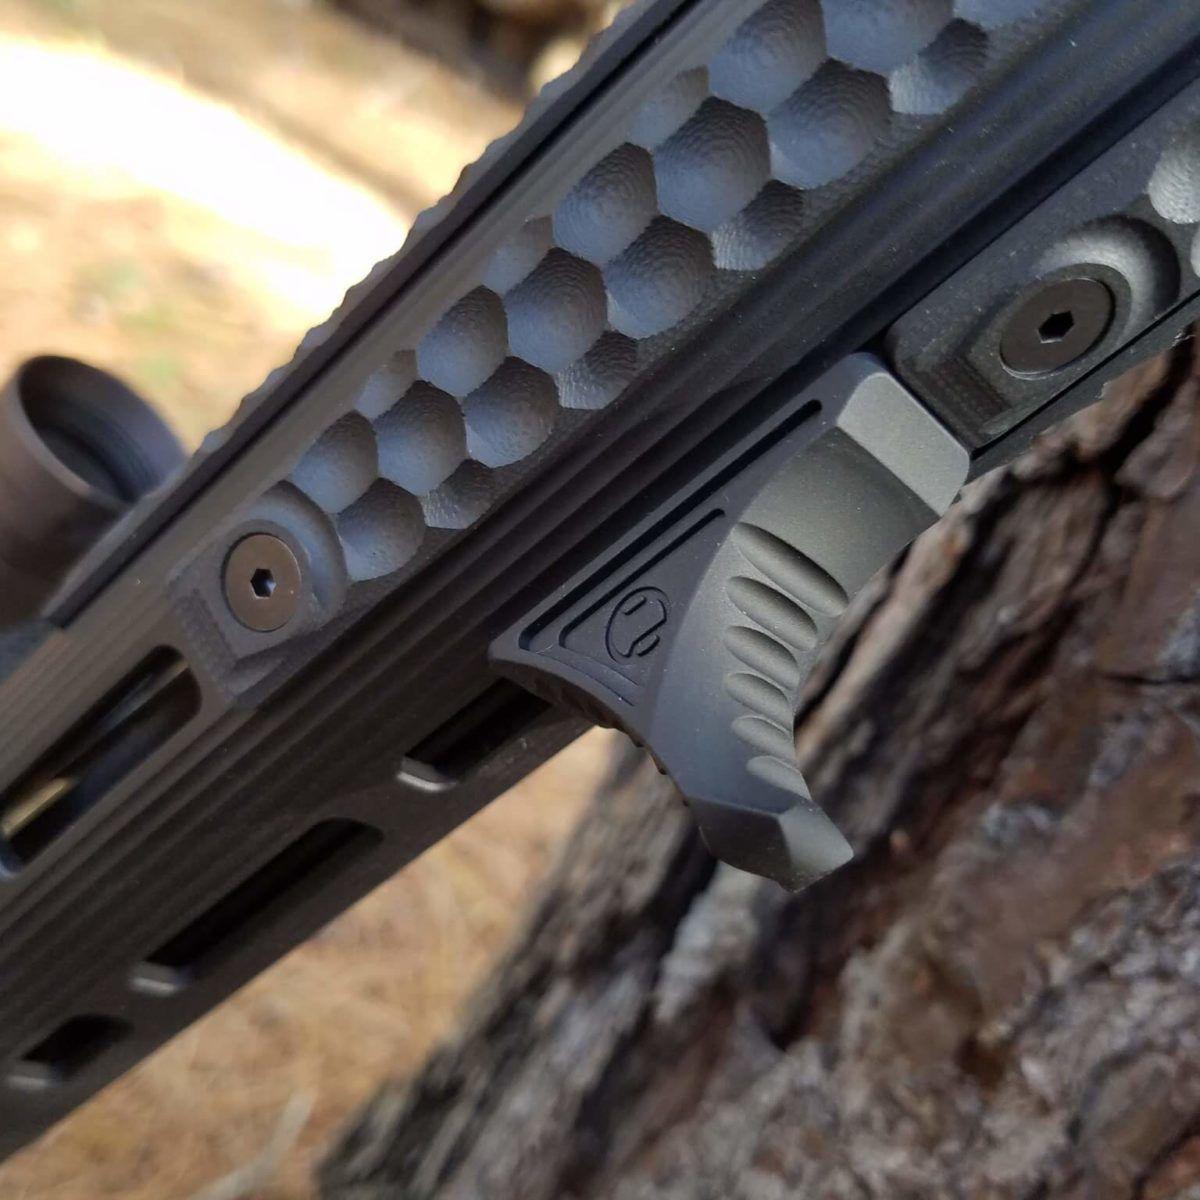 Best AR-15 Foregrips - An ARBuildJunkie Guide